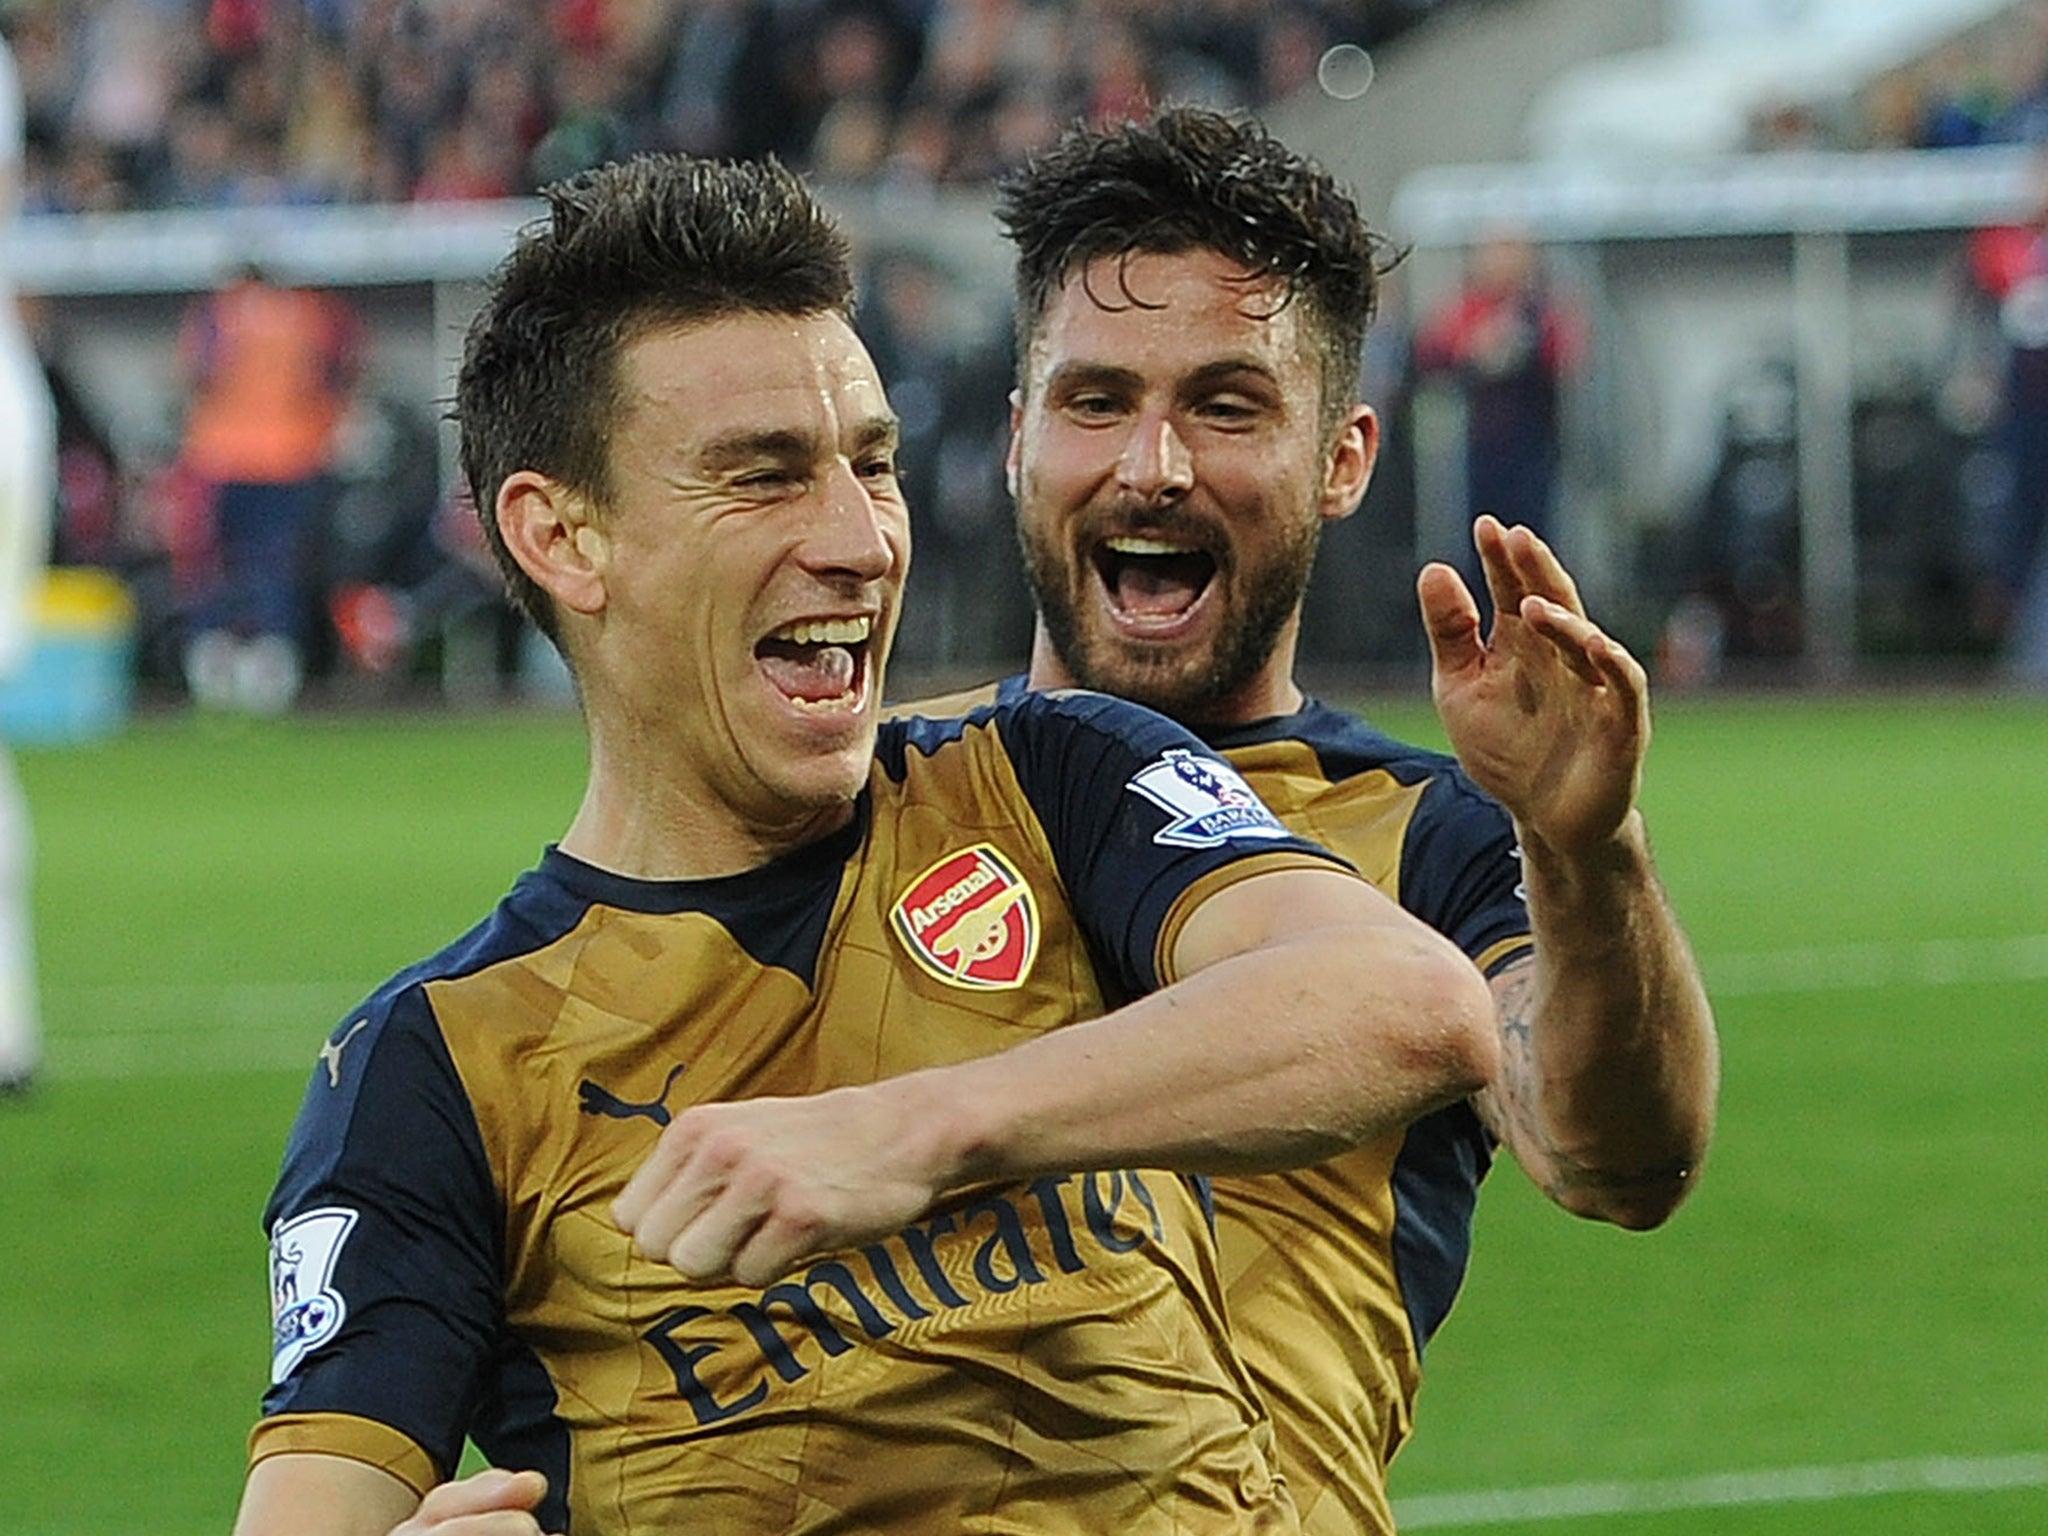 Arsenal injury news: Laurent Koscielny and Olivier Giroud to be assessed, Hector Bellerin returns